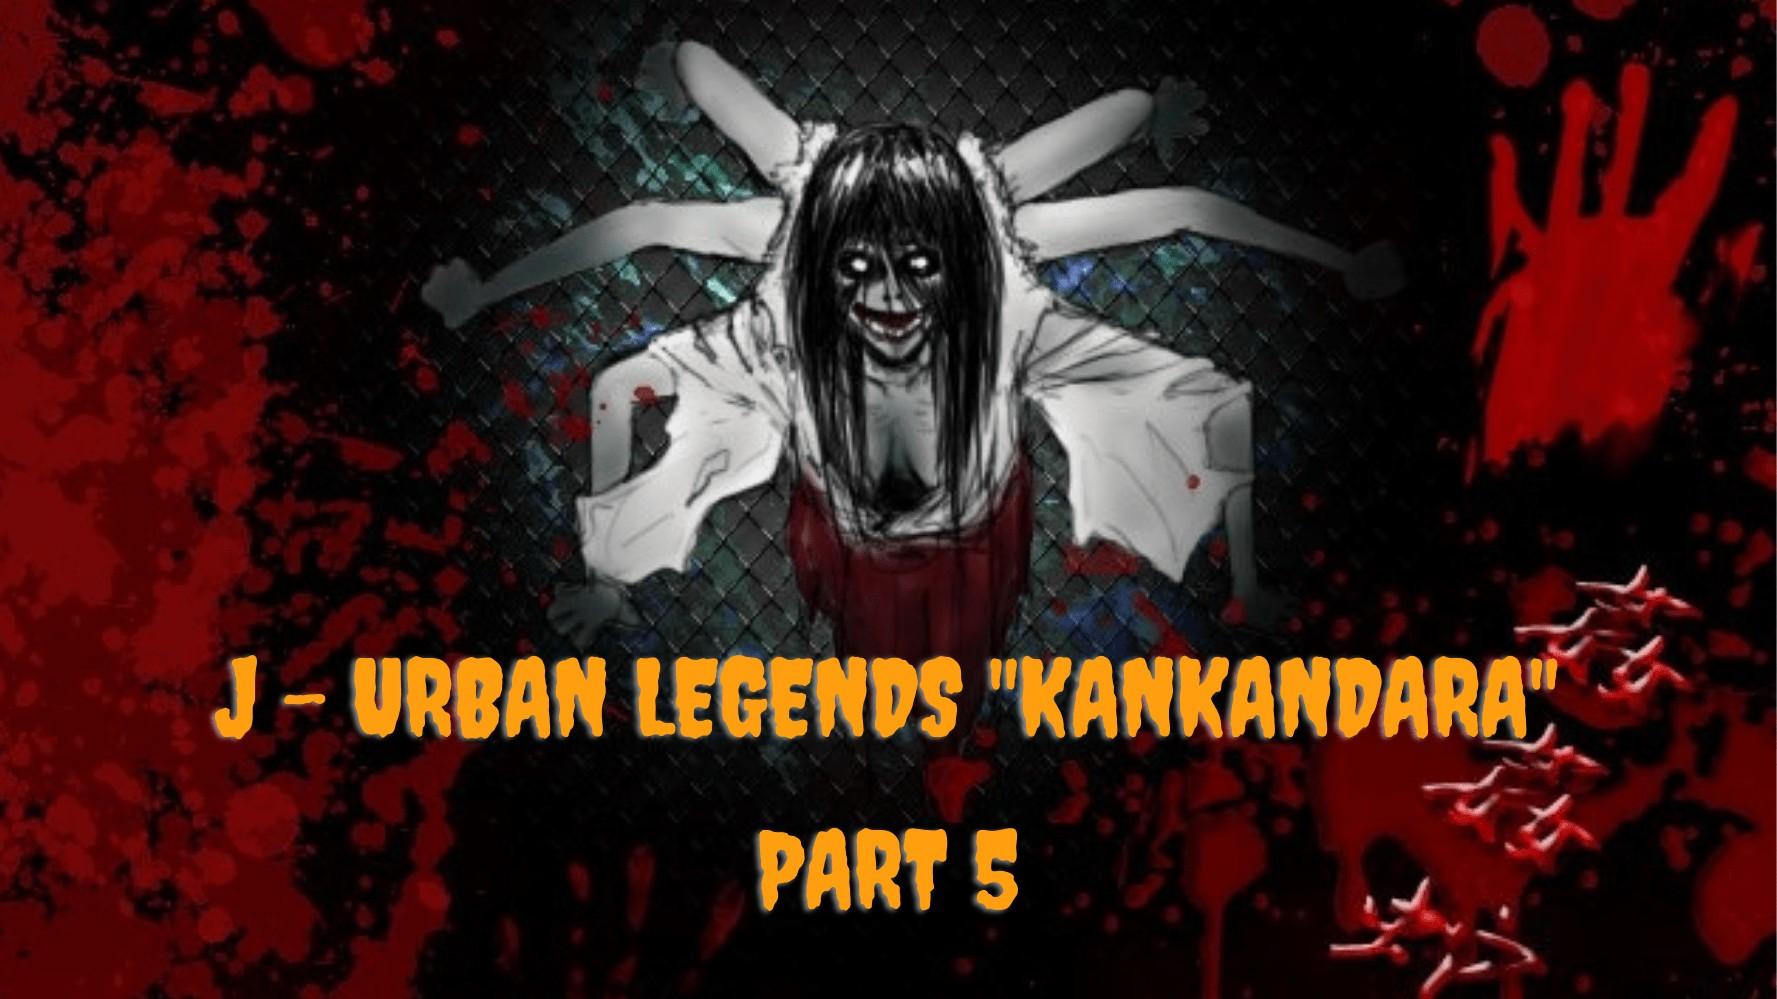 Legenda Urban Jepang Kankandara (Part 5)